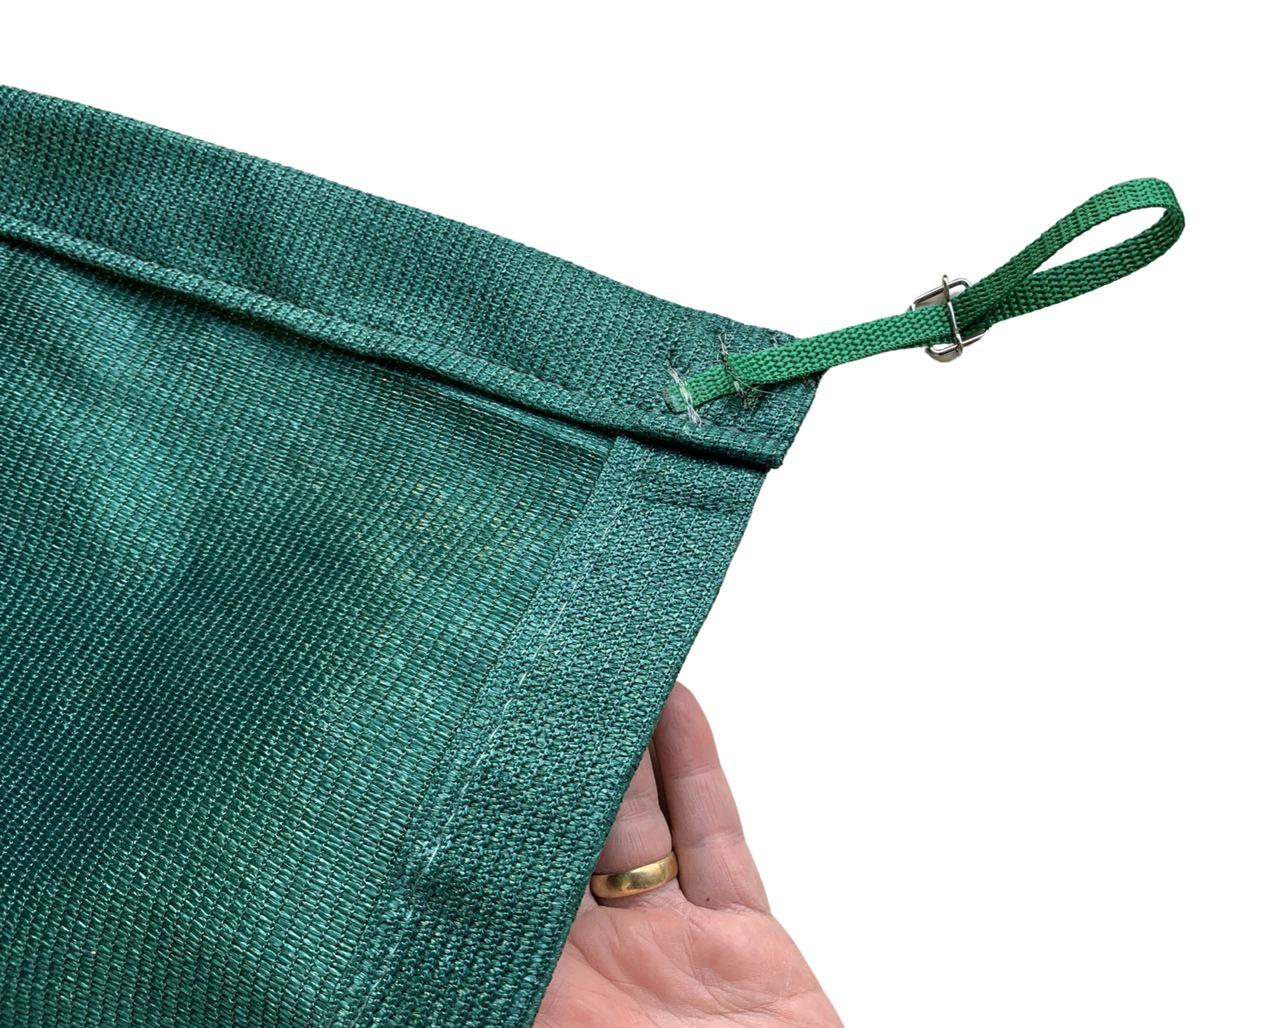 Tela de Sombreamento 90% Verde com Esticadores - Largura: 3 Metros